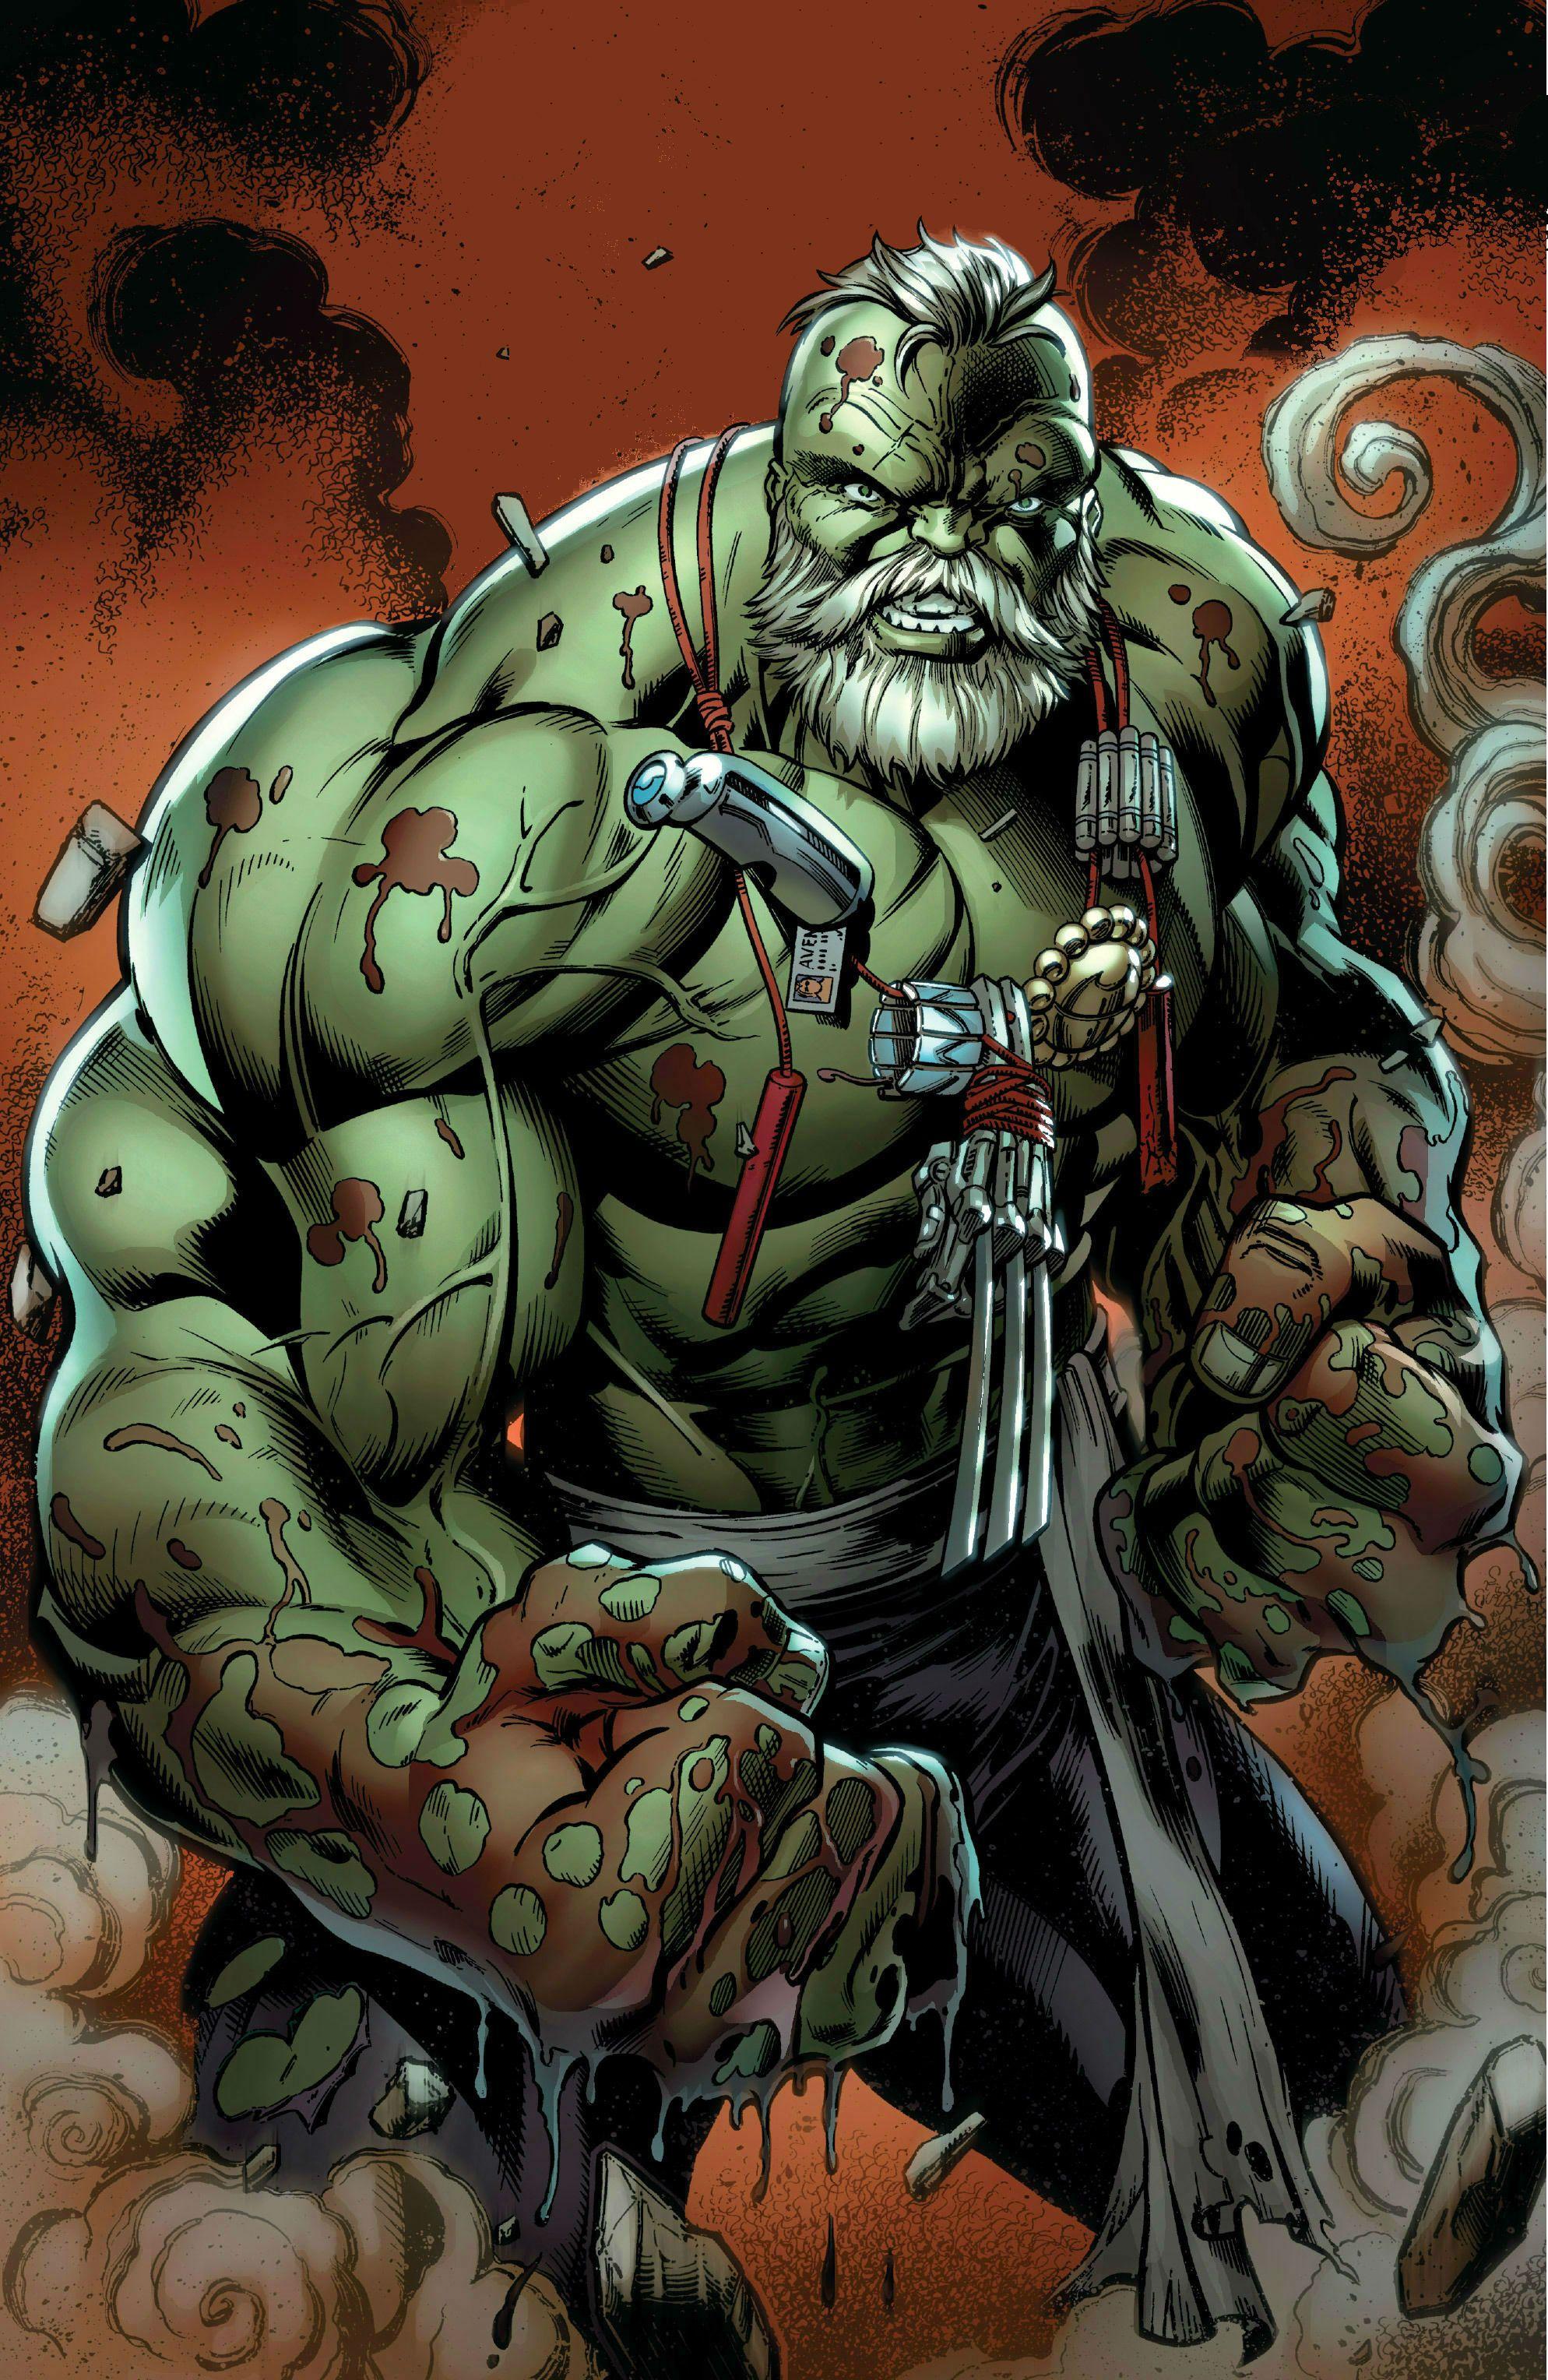 Doc Green (Dr. Bruce Banner) (Alternate Hulk persona) | art by Mark Bagley  | Hulk art, Hulk marvel, Marvel comic universe